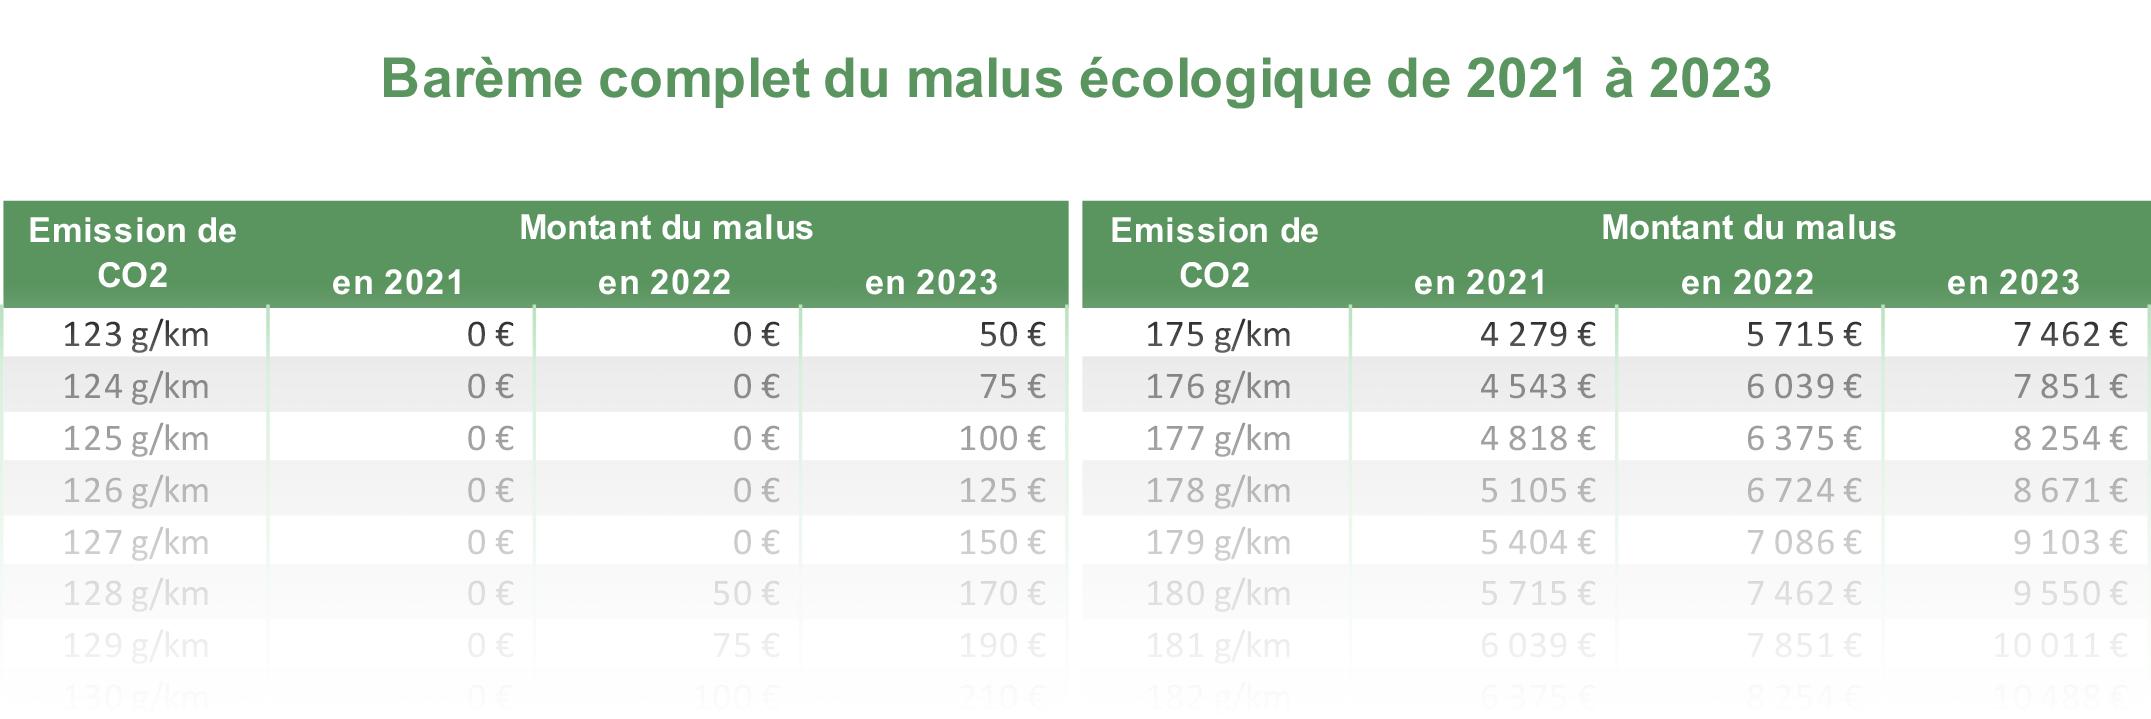 bareme malus 2021-2023